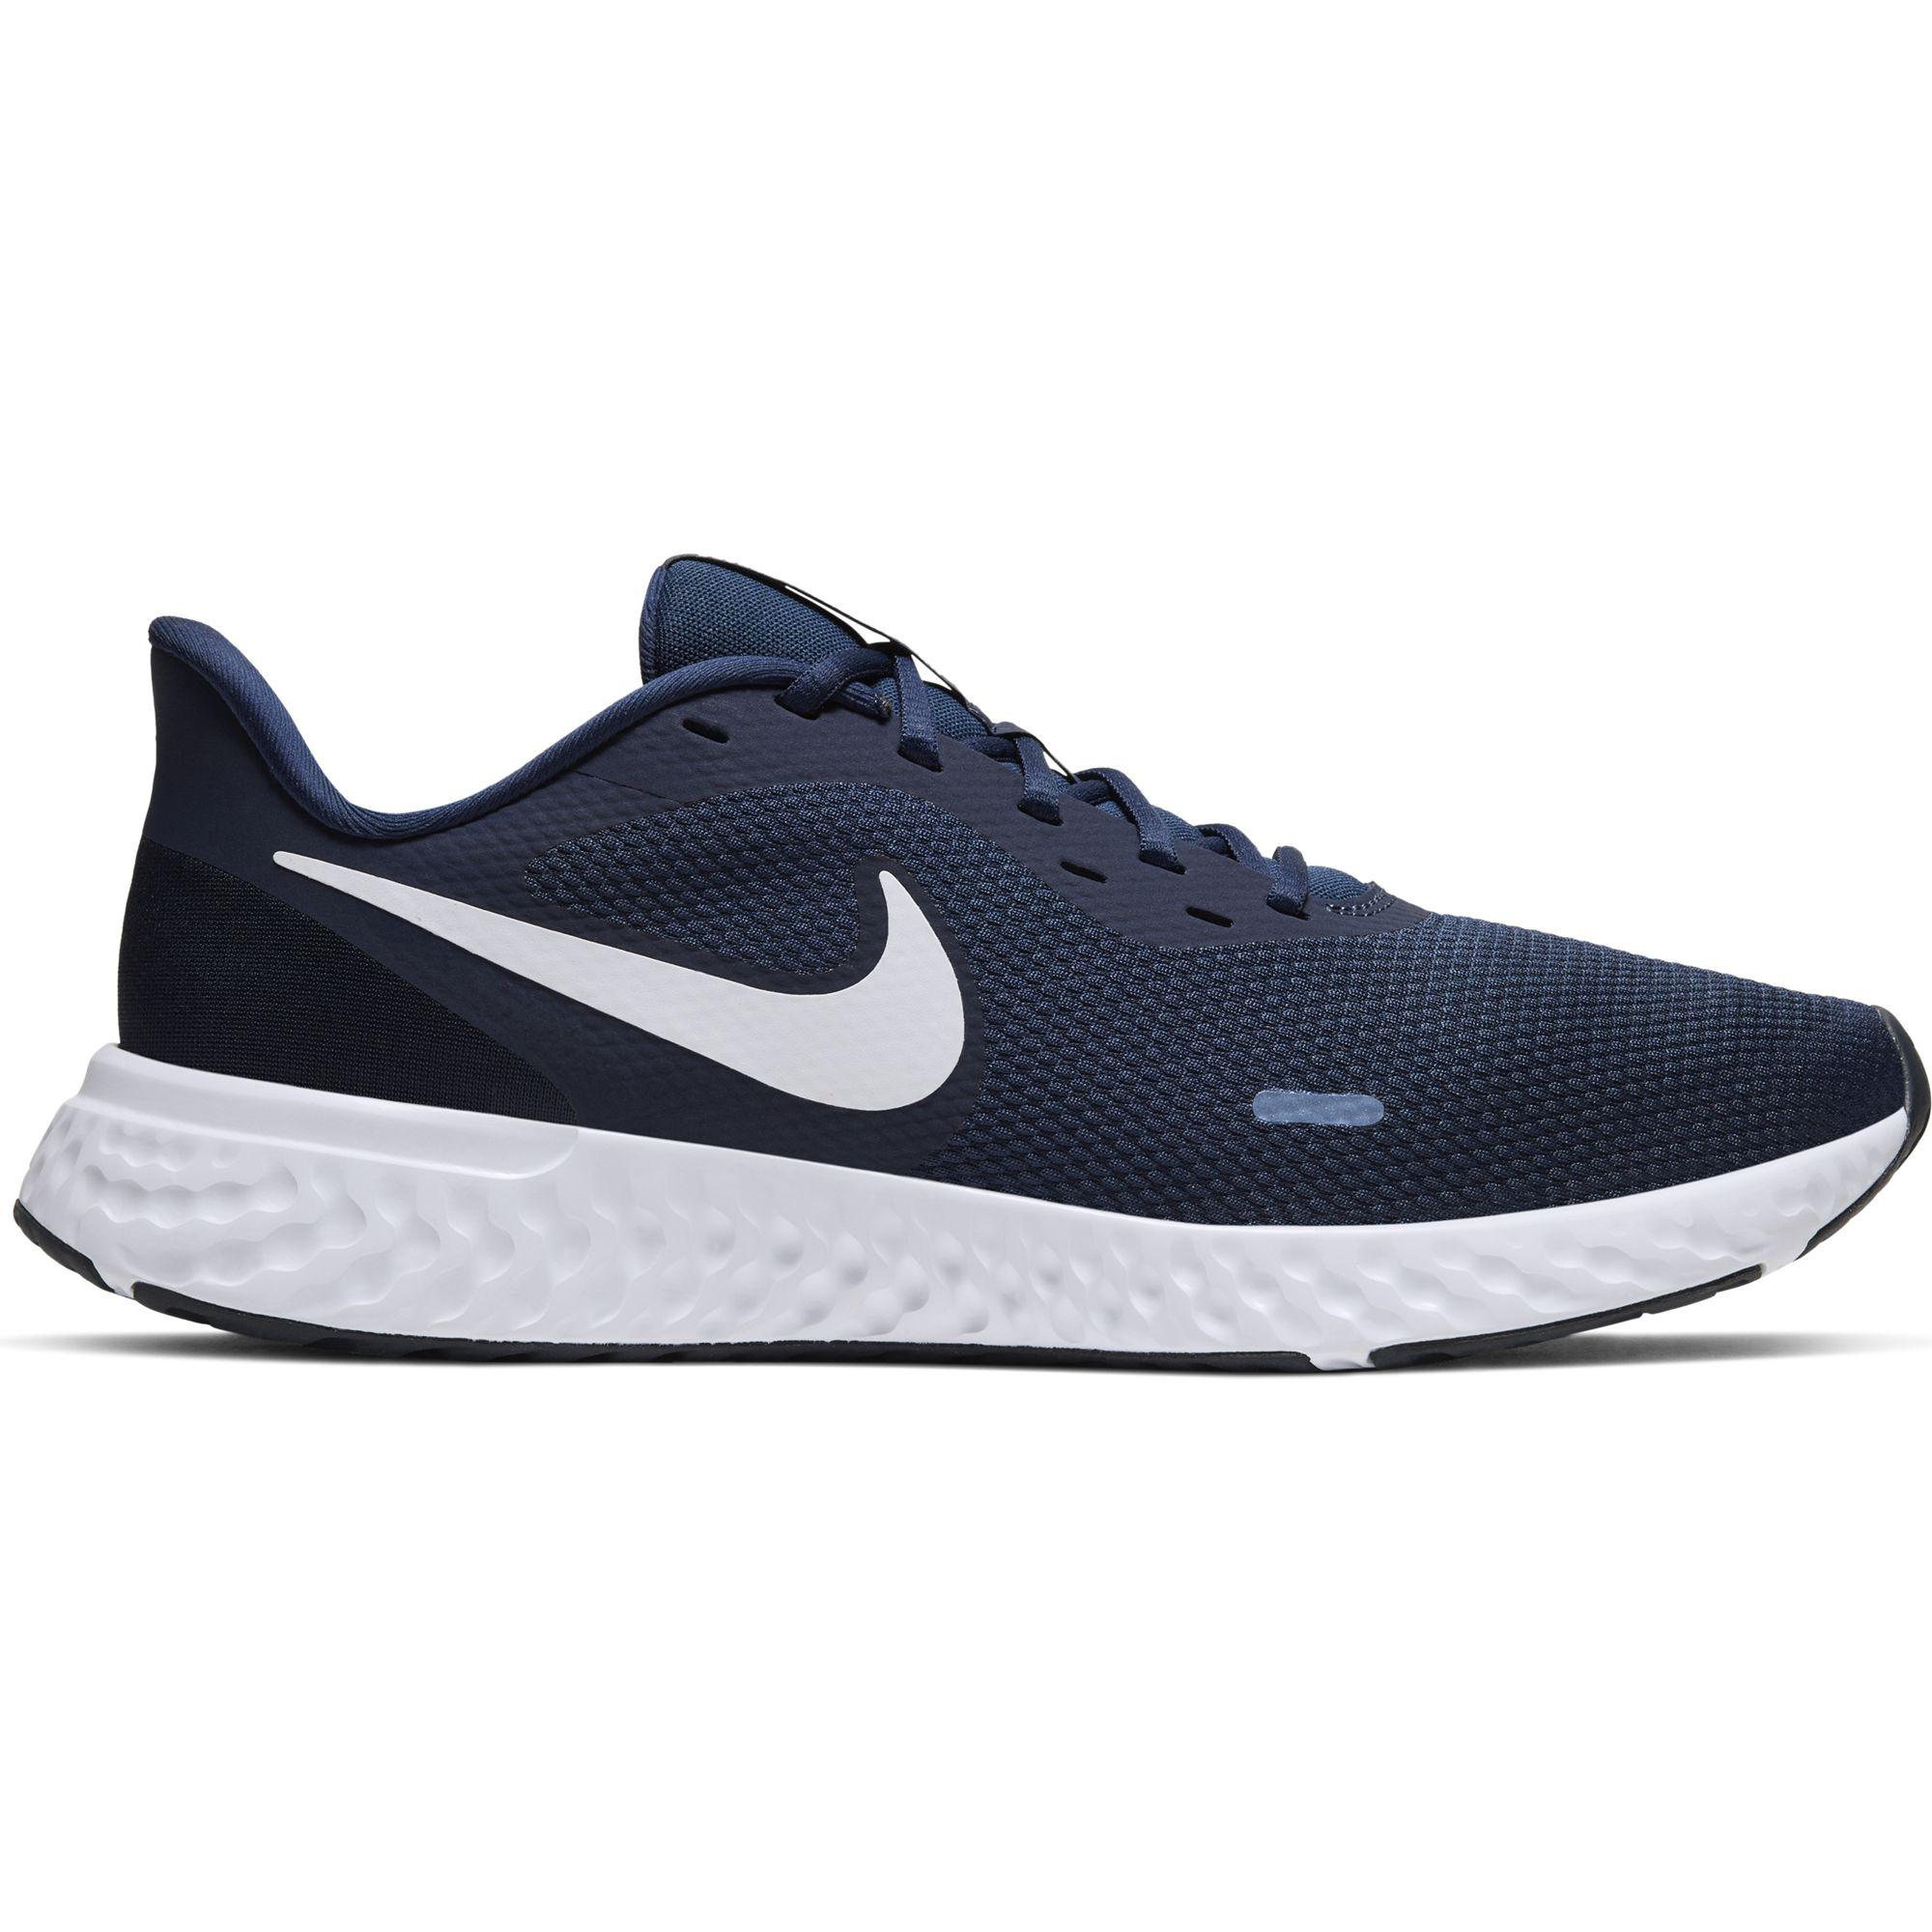 Men's Revolution 5 Running Shoes, Navy/White, swatch